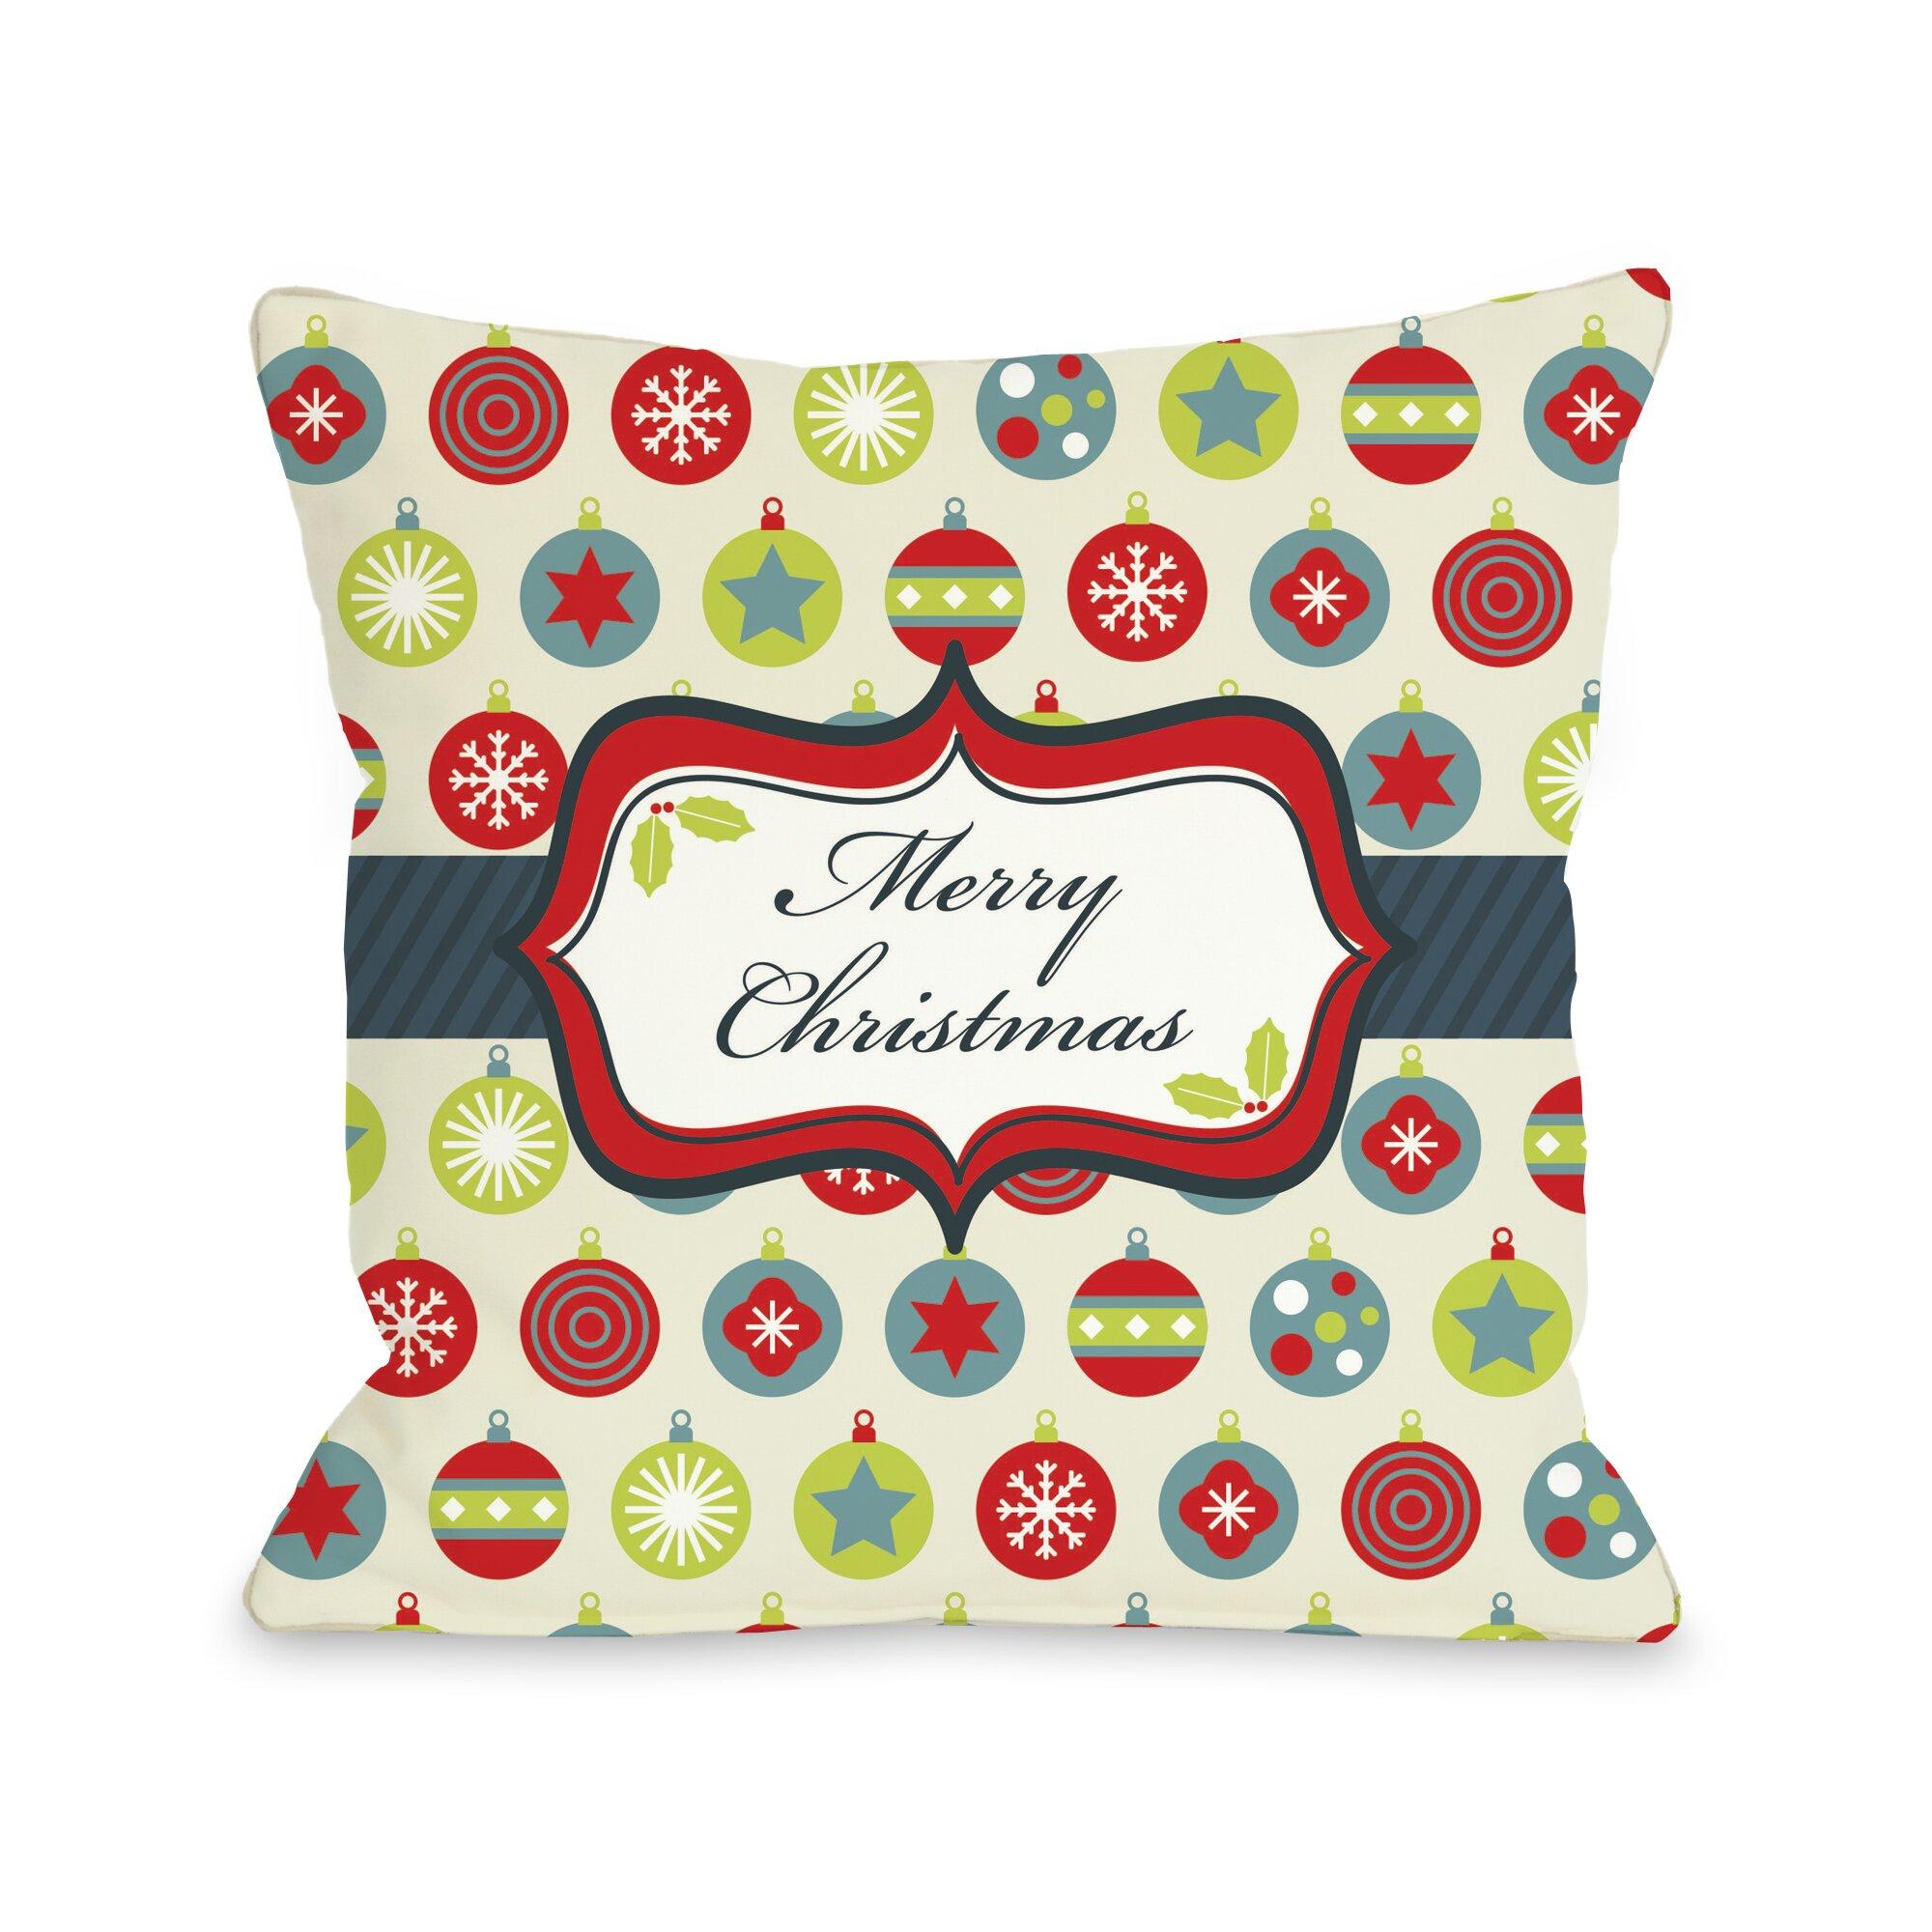 One Bella Casa Holiday Merry Christmas Ornaments Throw Pillow & Reviews Wayfair